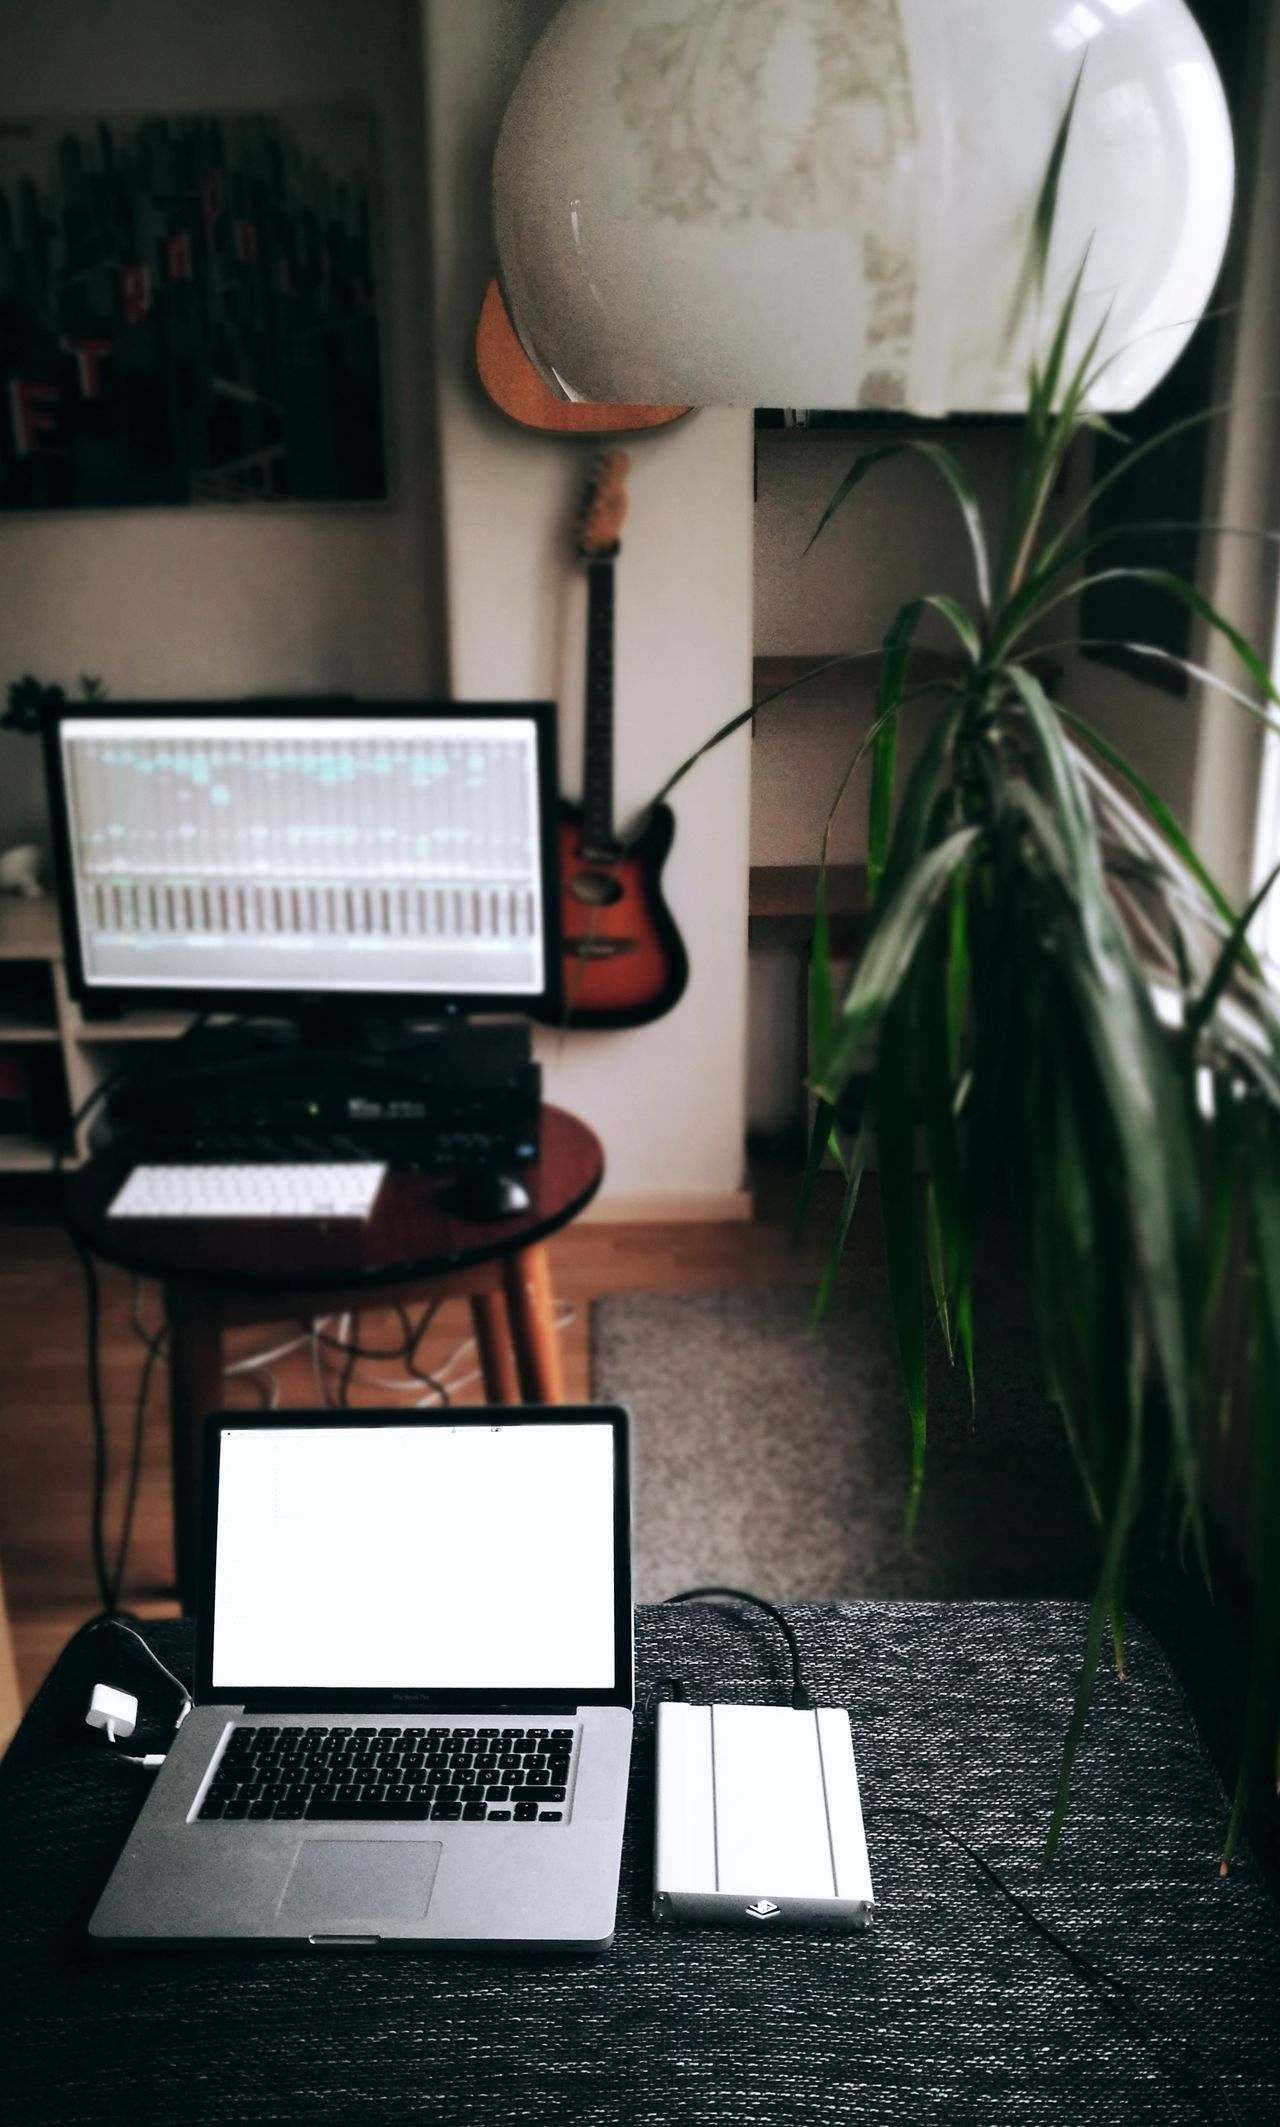 Work Workplace Music MusicProduction Homeoffice Laptop MacBookPro Indoors  Living Room